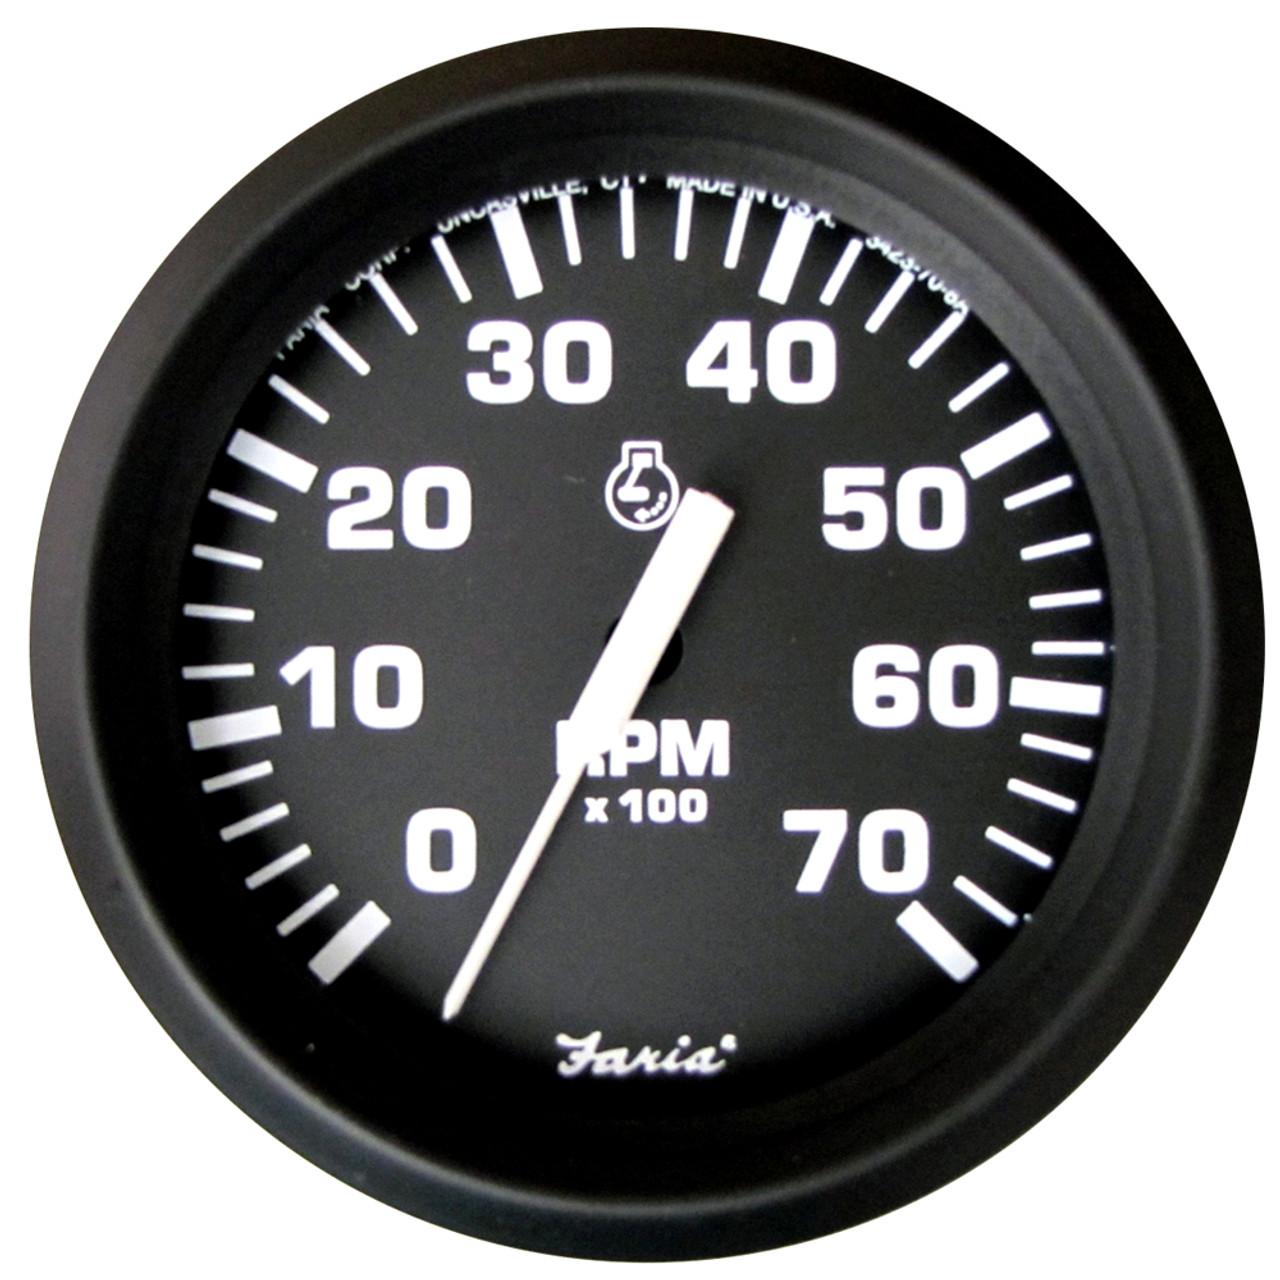 Boat speedometer yamaha Yamaha Outboard